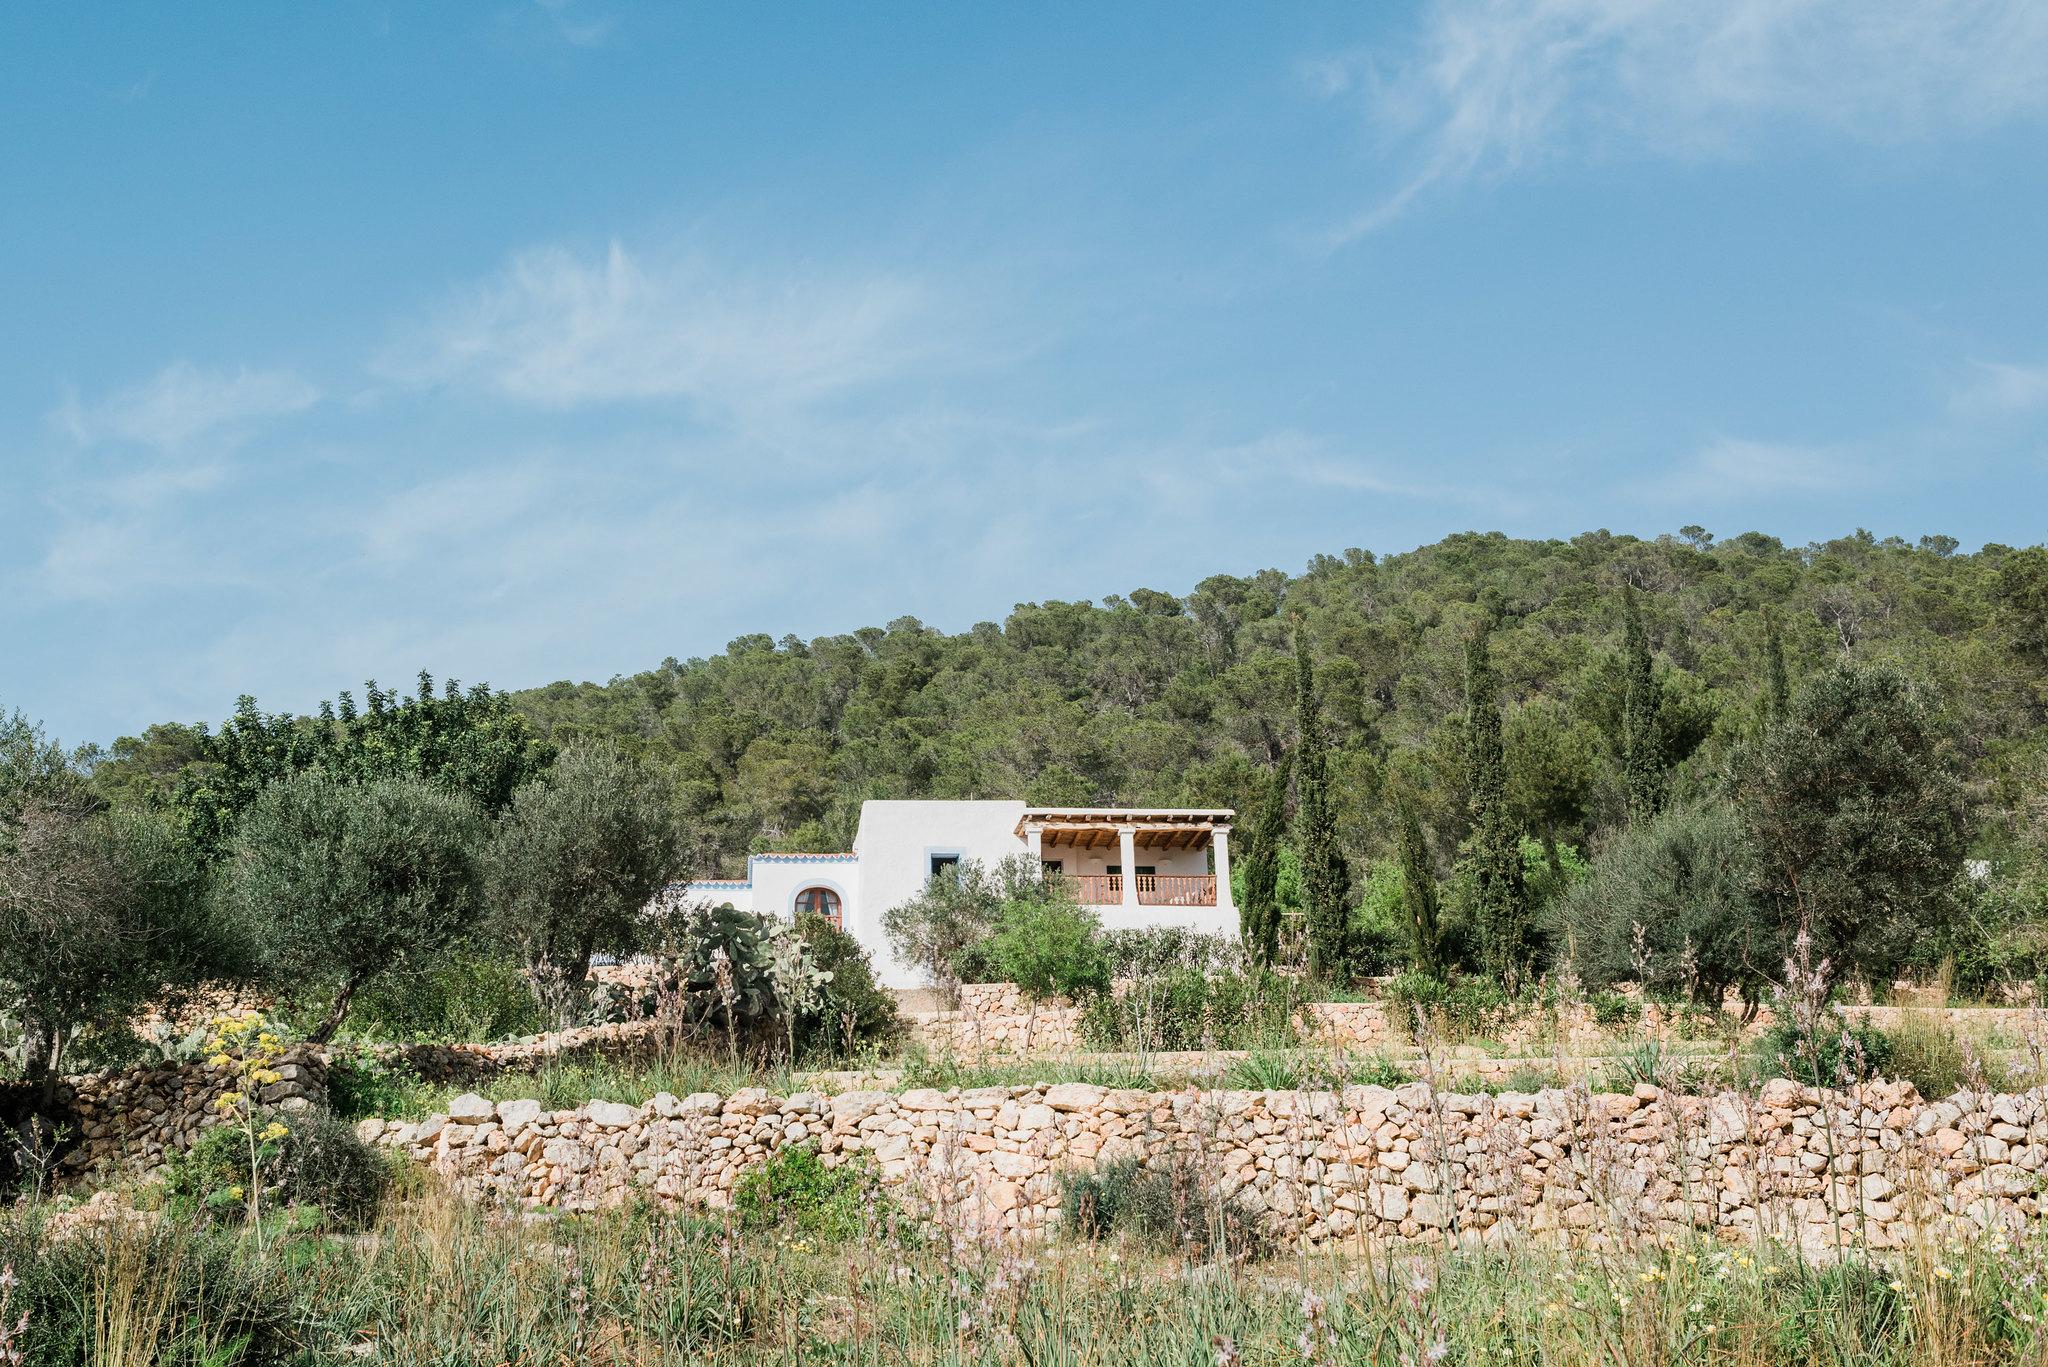 https://www.white-ibiza.com/wp-content/uploads/2020/06/white-ibiza-villas-los-corrales-exterior-house-from-afar.jpg